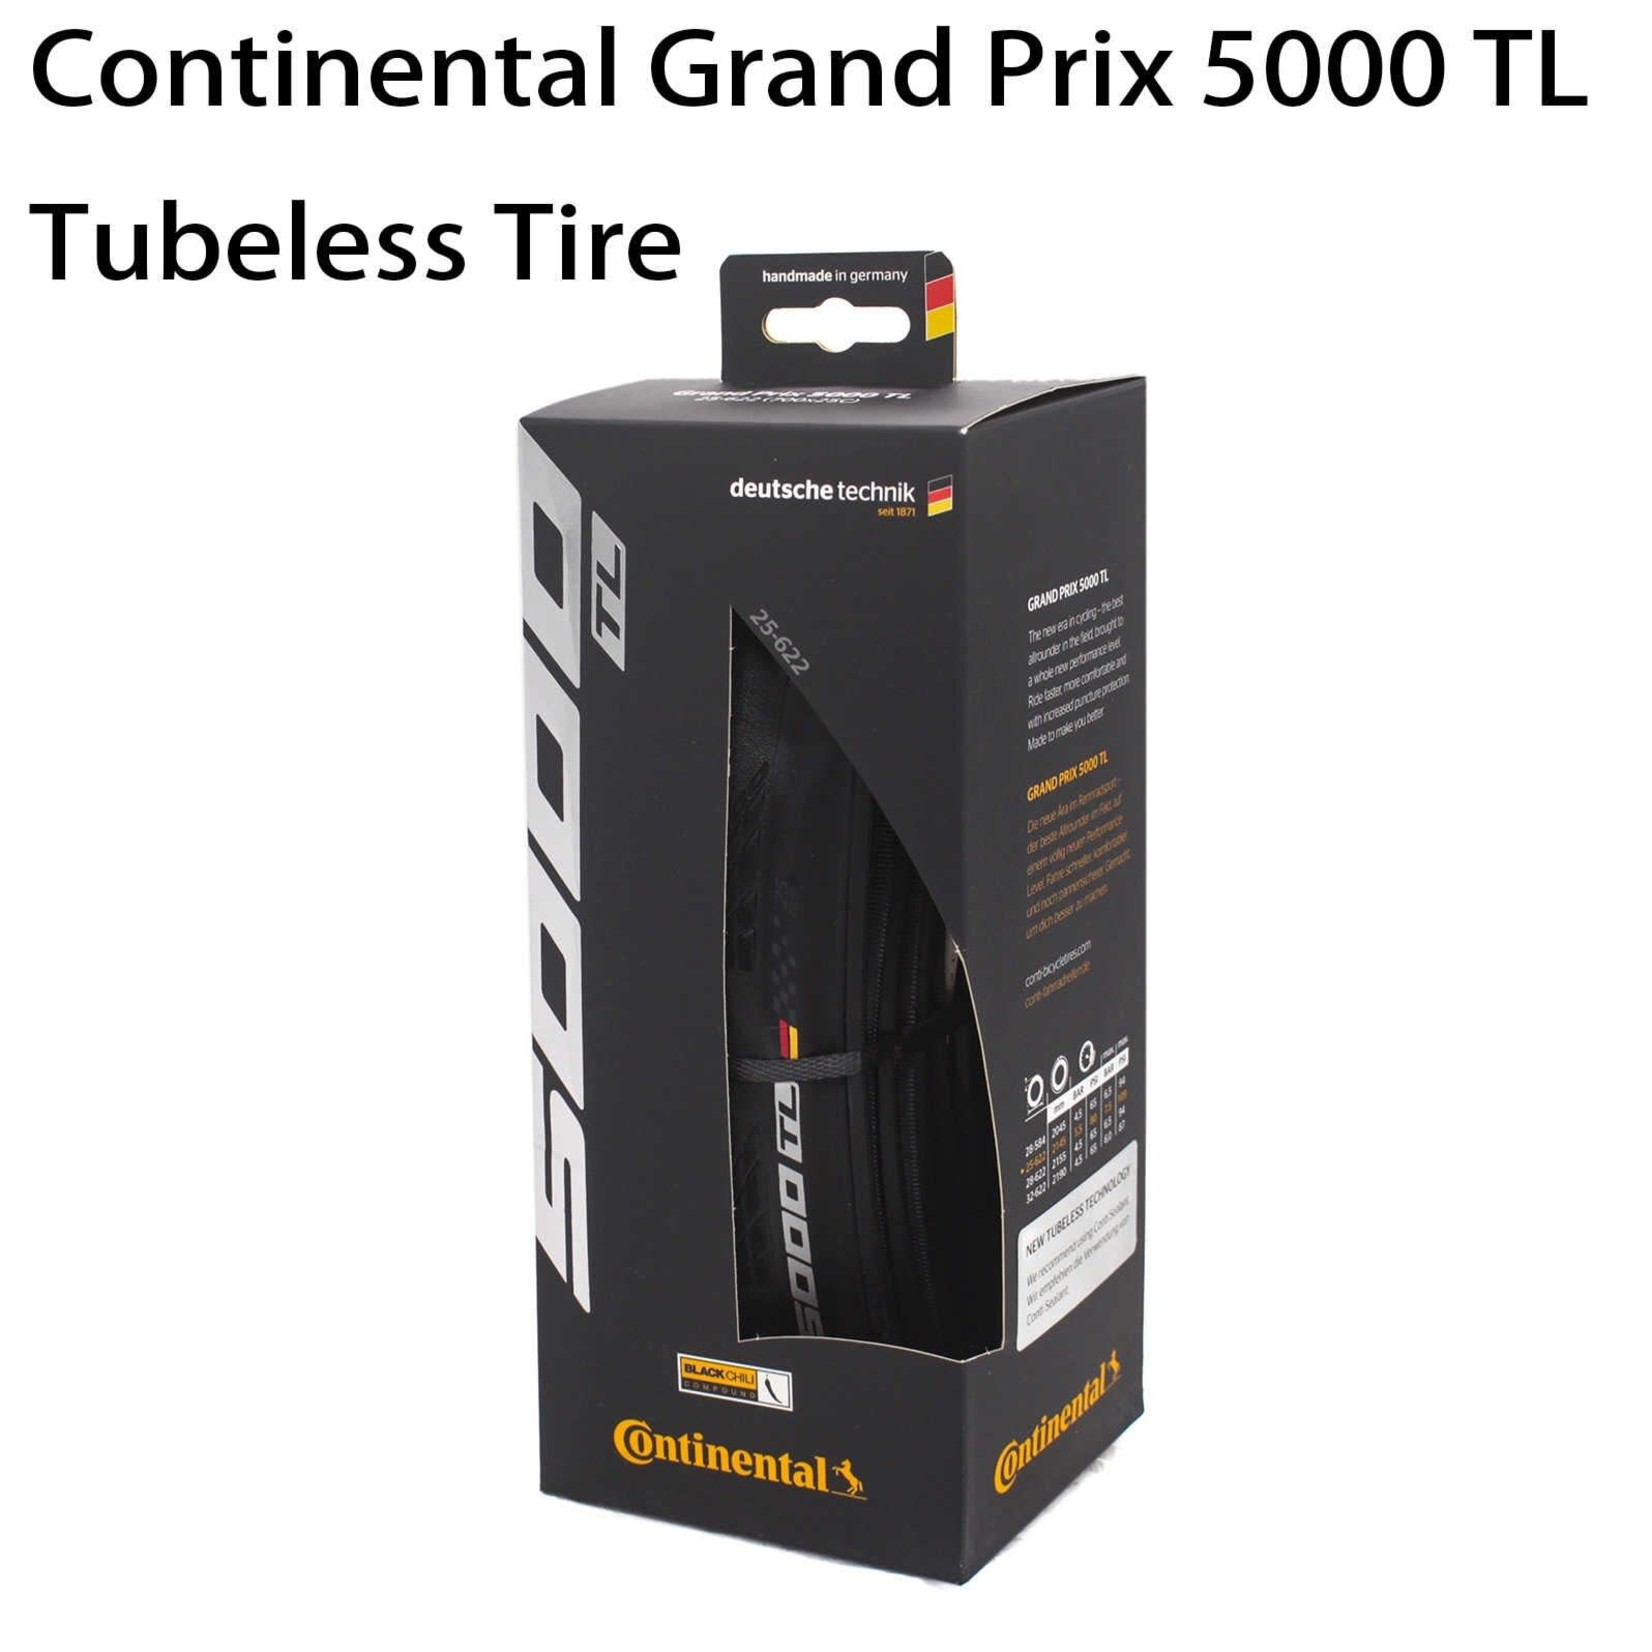 Continental Continental Grand Prix 5000 Tubeless TL